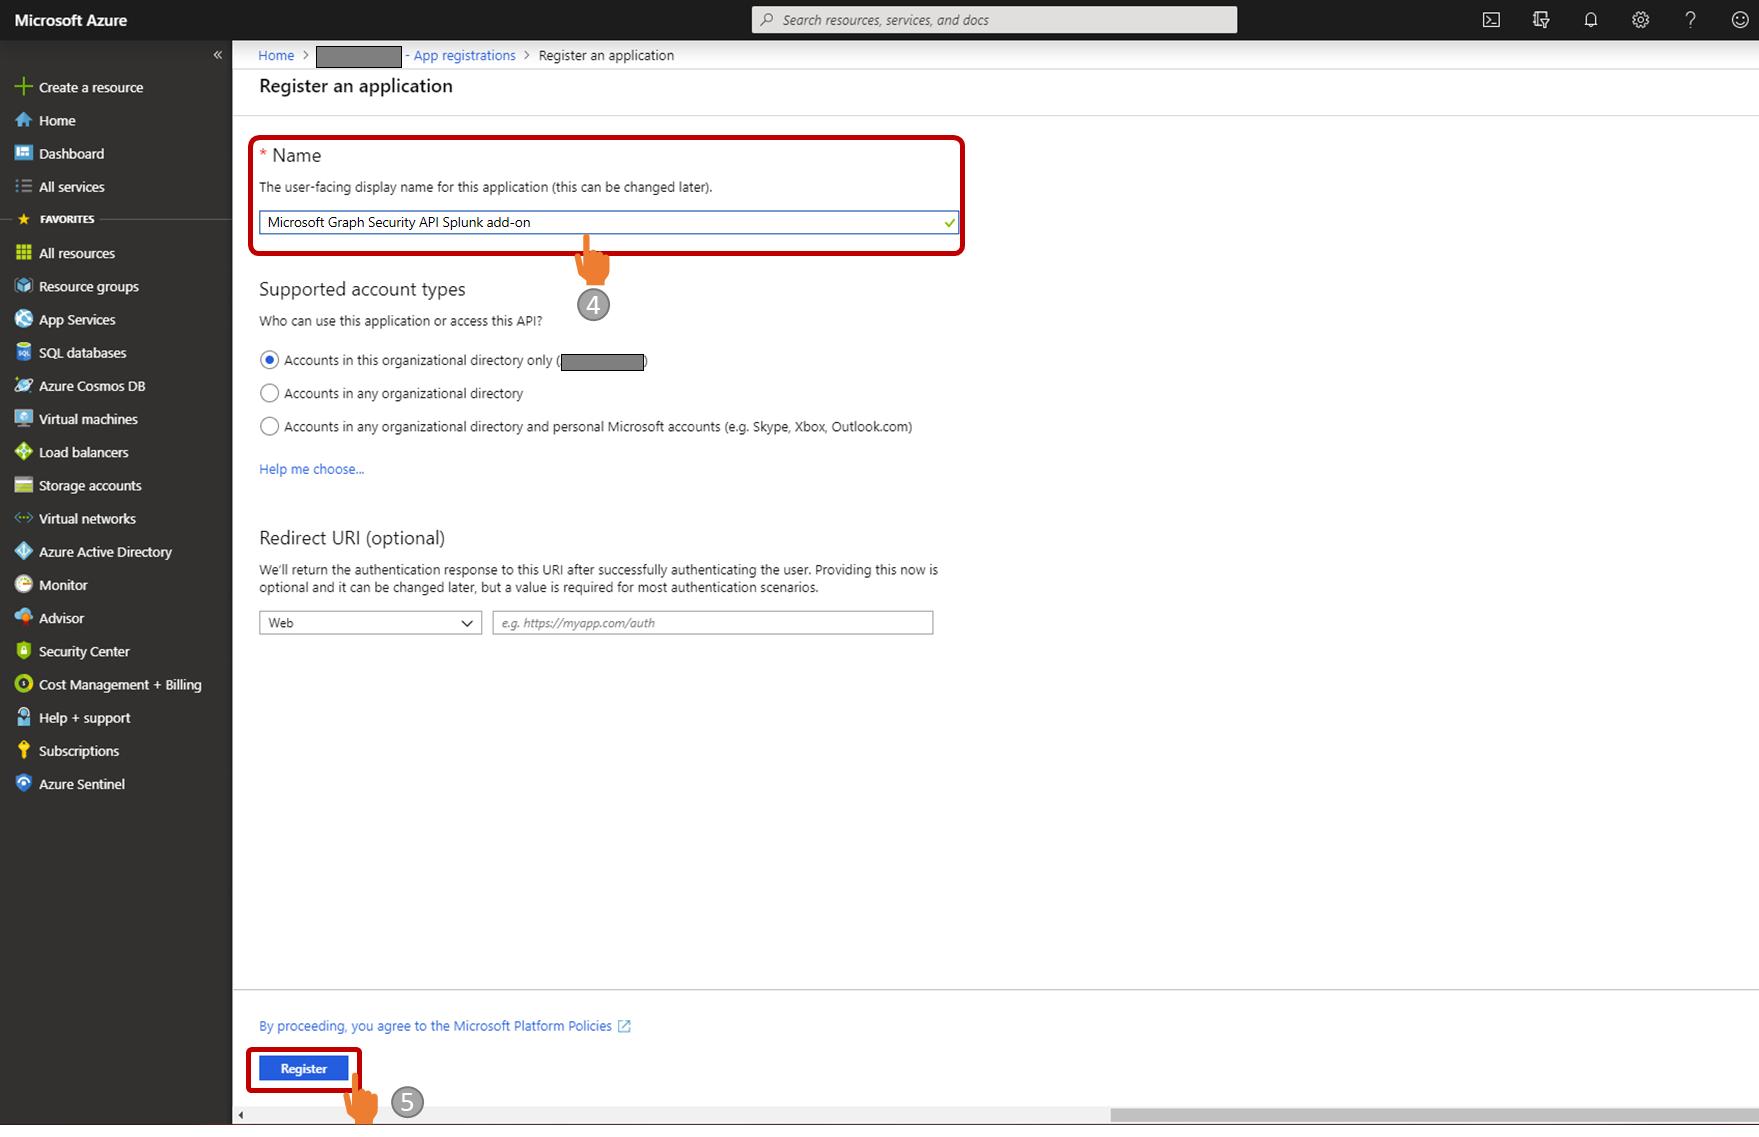 Figure 2. Register application screen